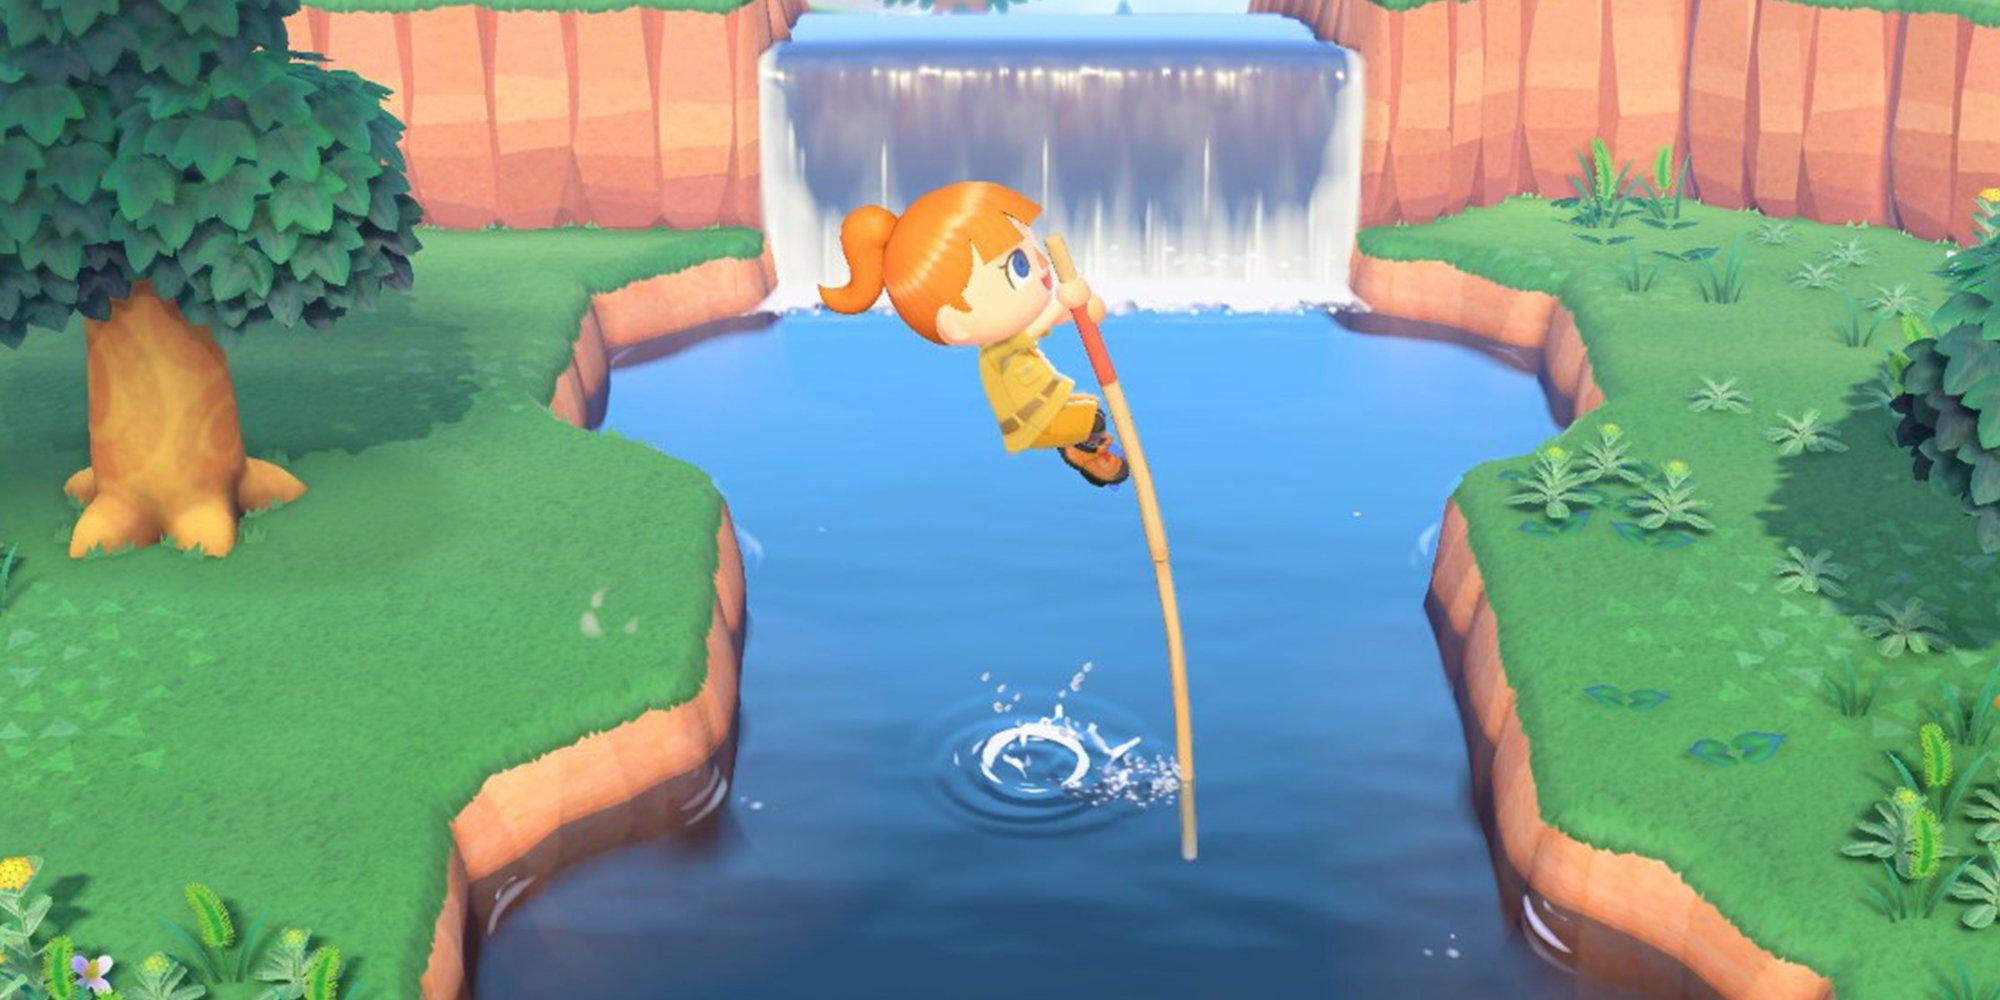 Animal Crossing New Horizons: How To Unlock The Vaulting Pole Merchandise